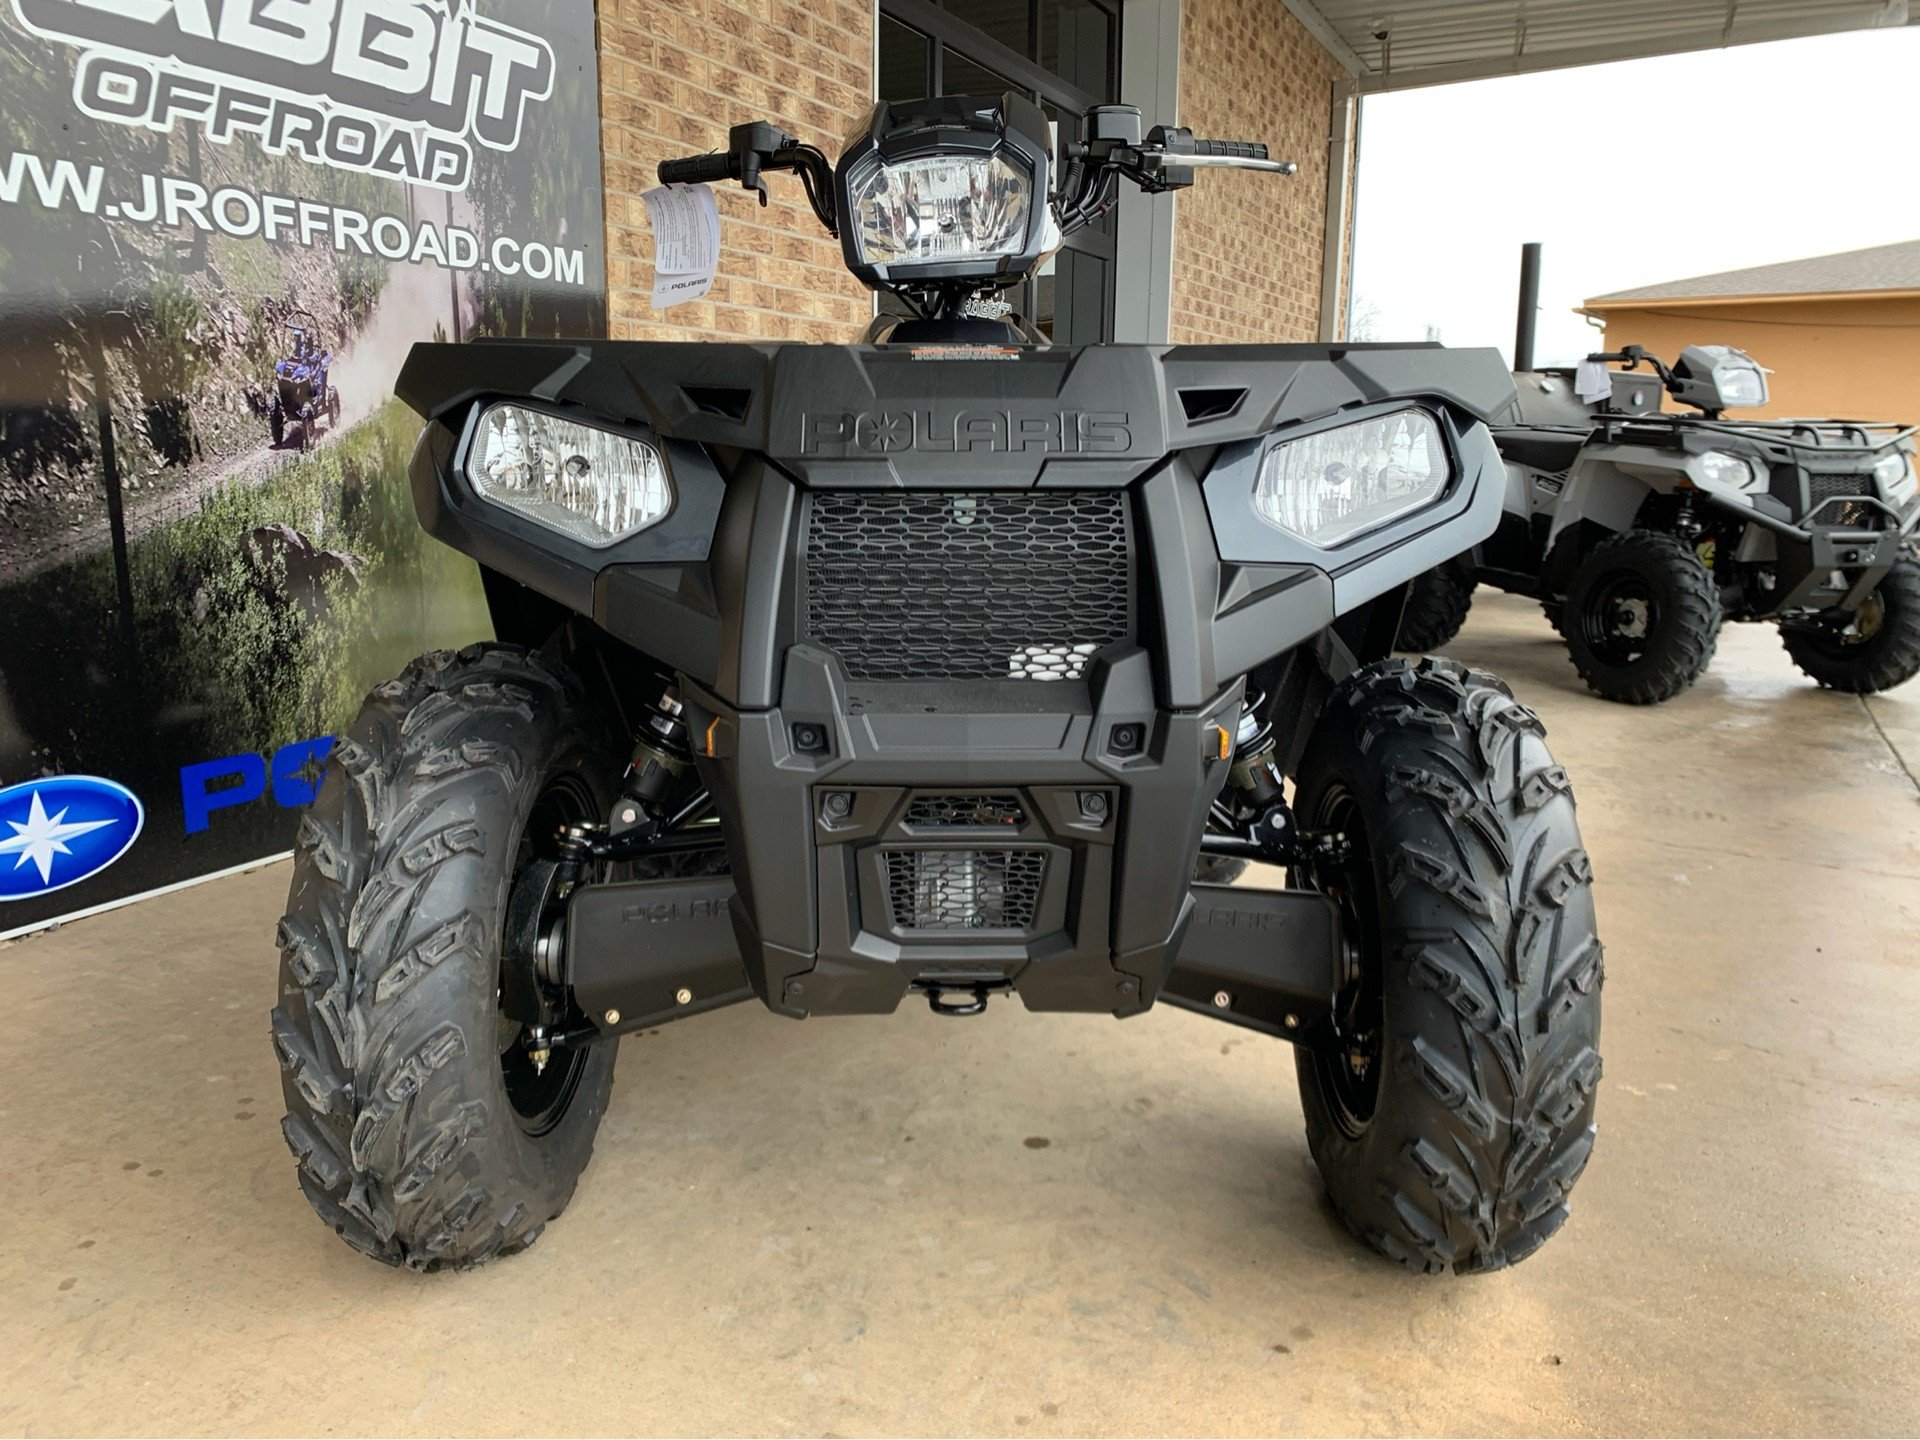 2019 Polaris Sportsman 570 SP in Marshall, Texas